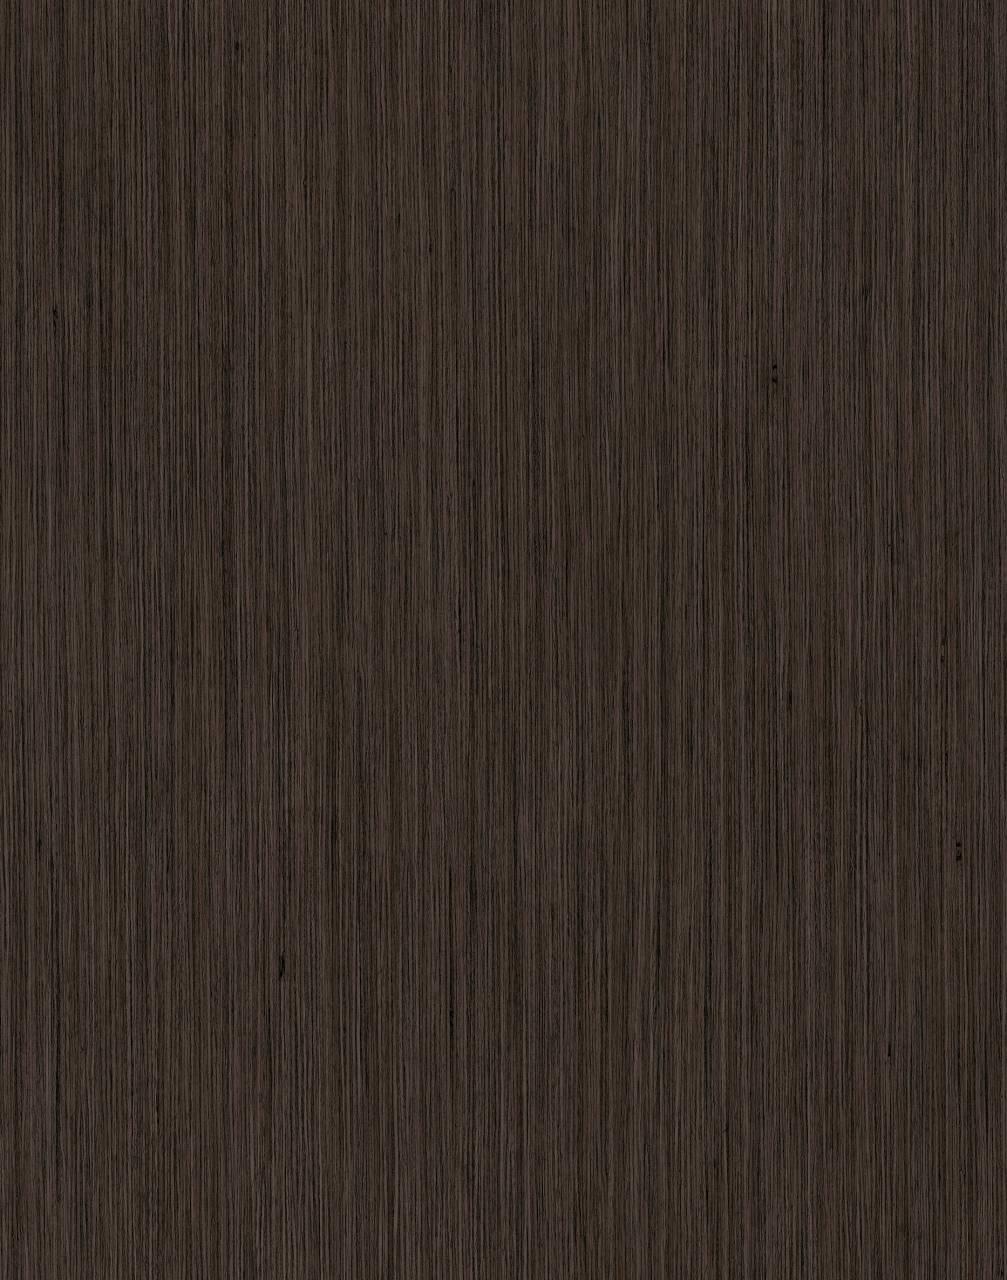 8548 Fineline Mocca (MF PB sample)